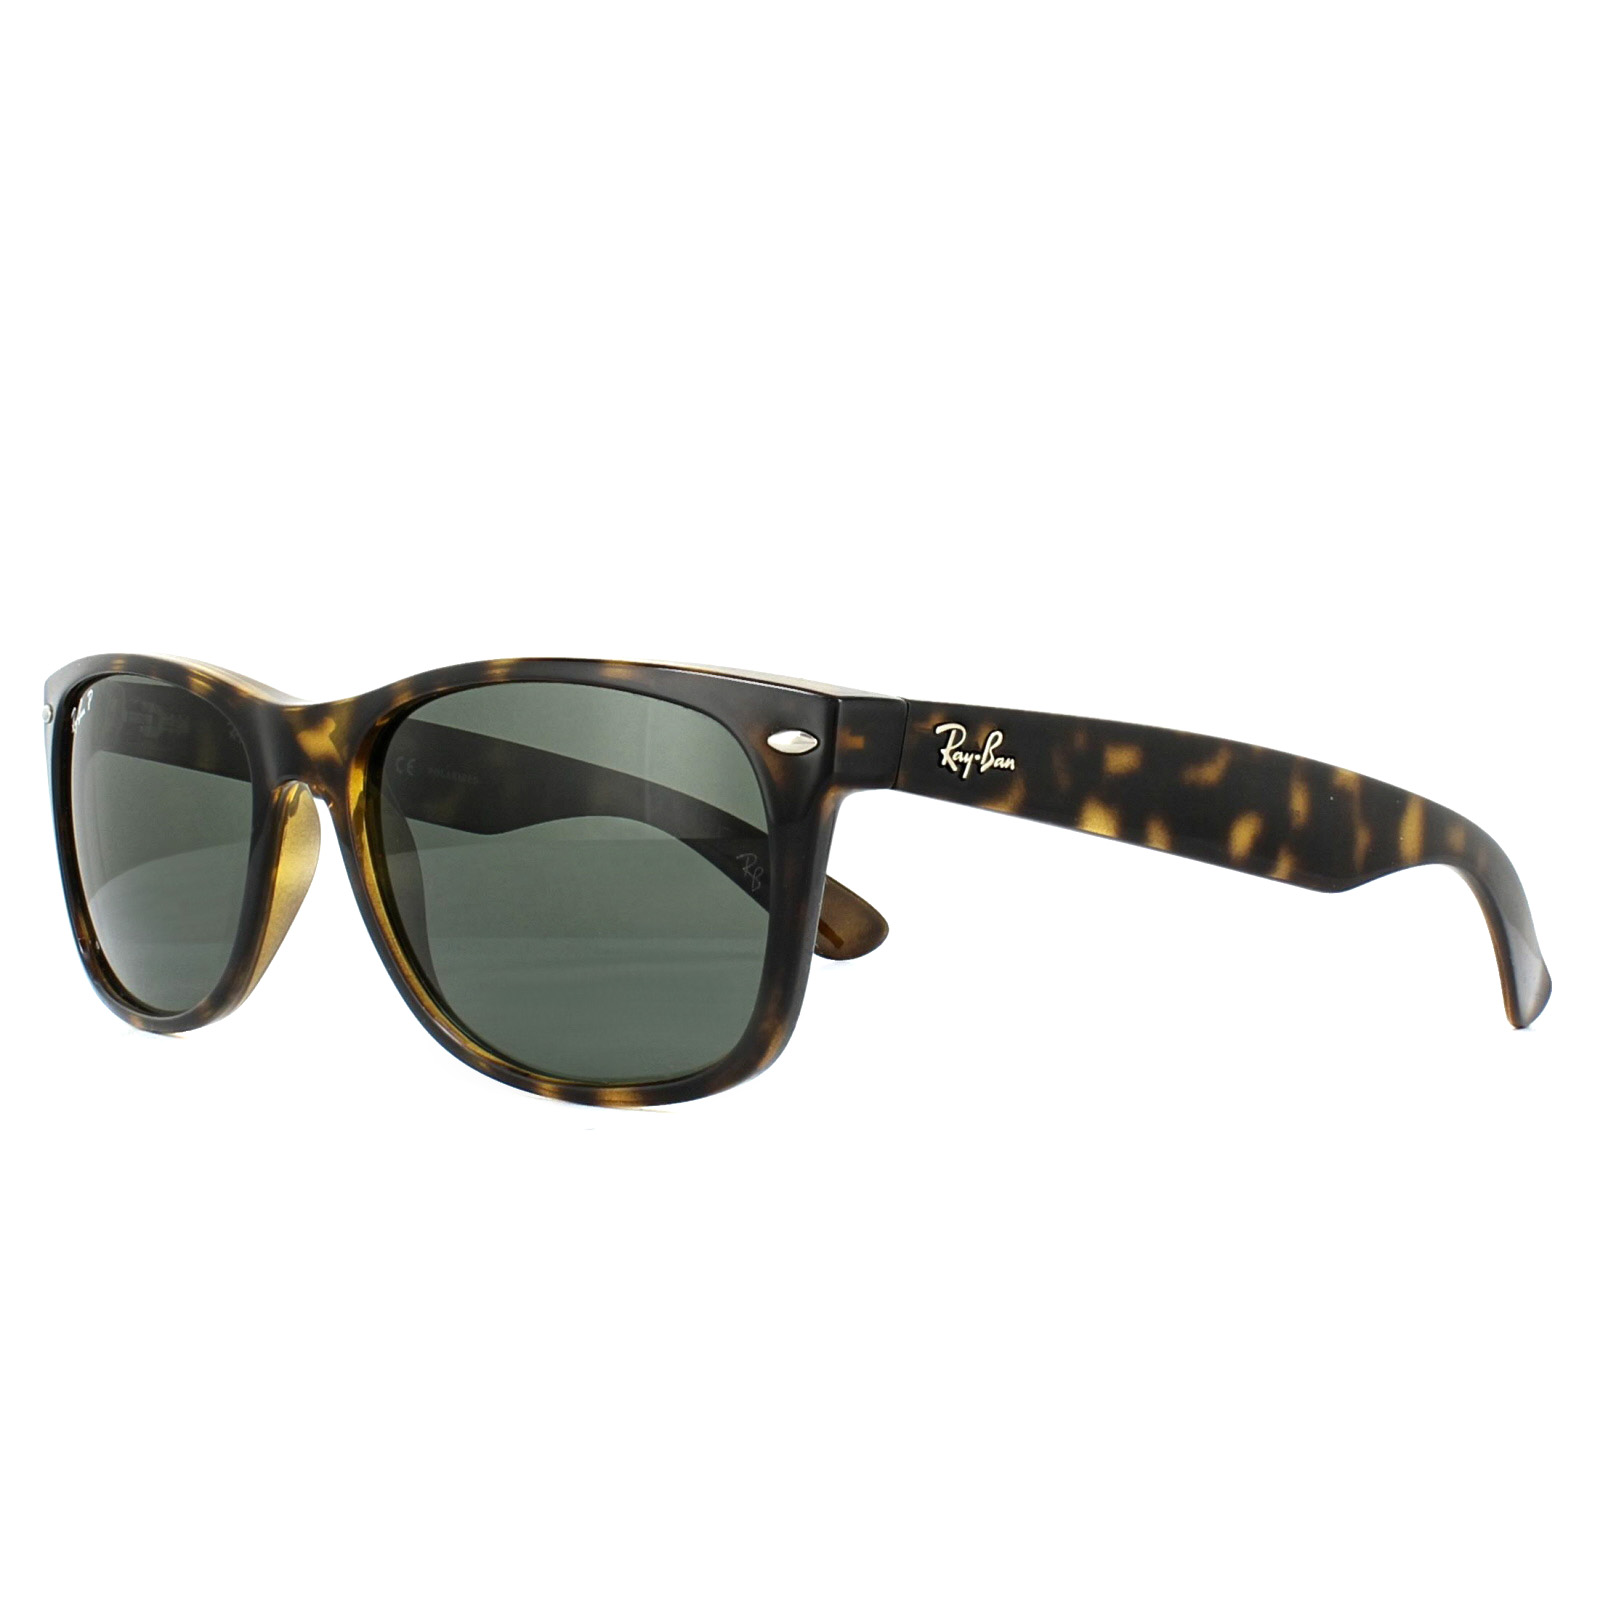 ba3b660084 Sentinel Ray-Ban Sunglasses New Wayfarer 2132 902 58 Tortoise Green  Polarized 58mm Large